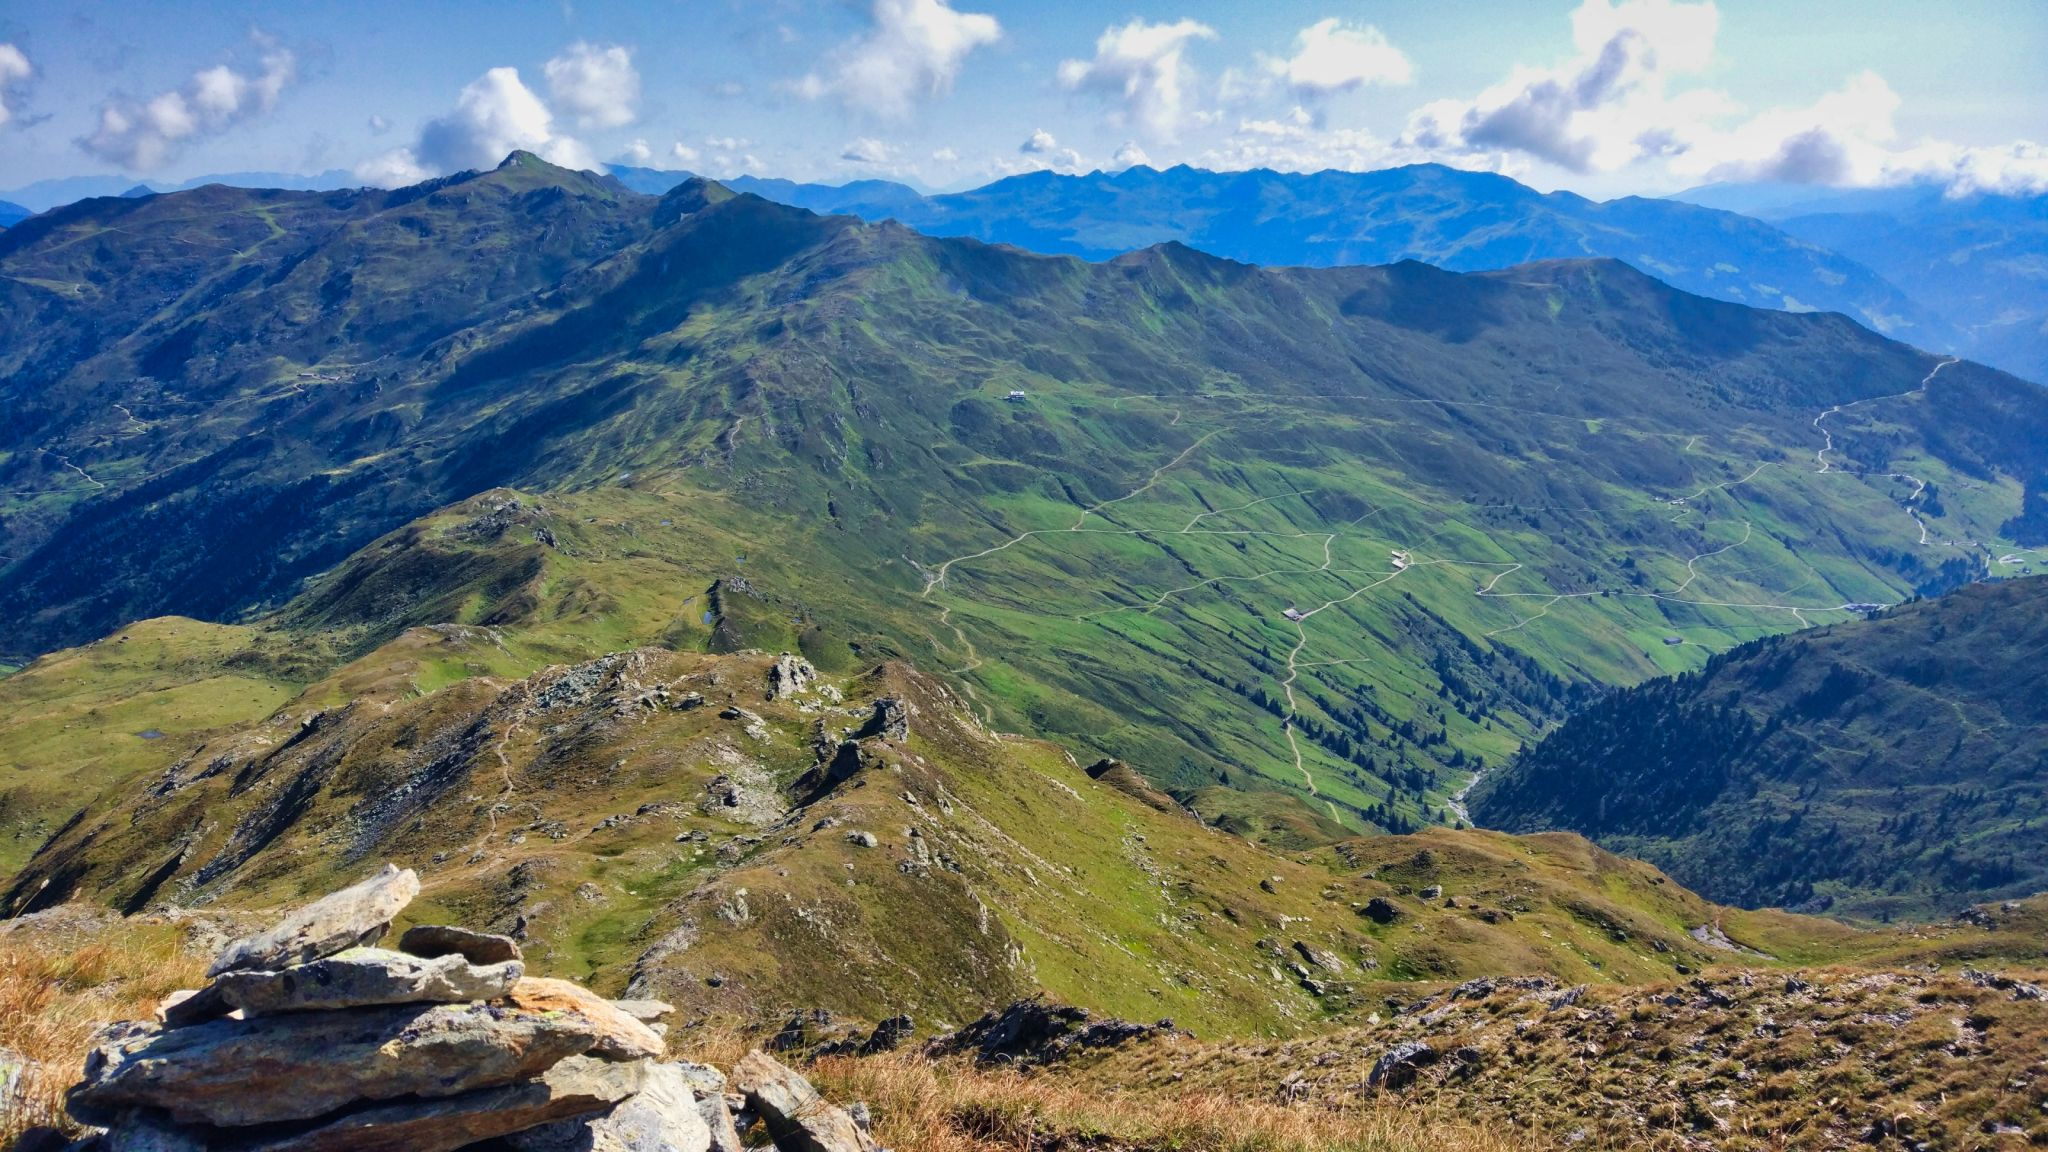 View from Rosskopf, Austria